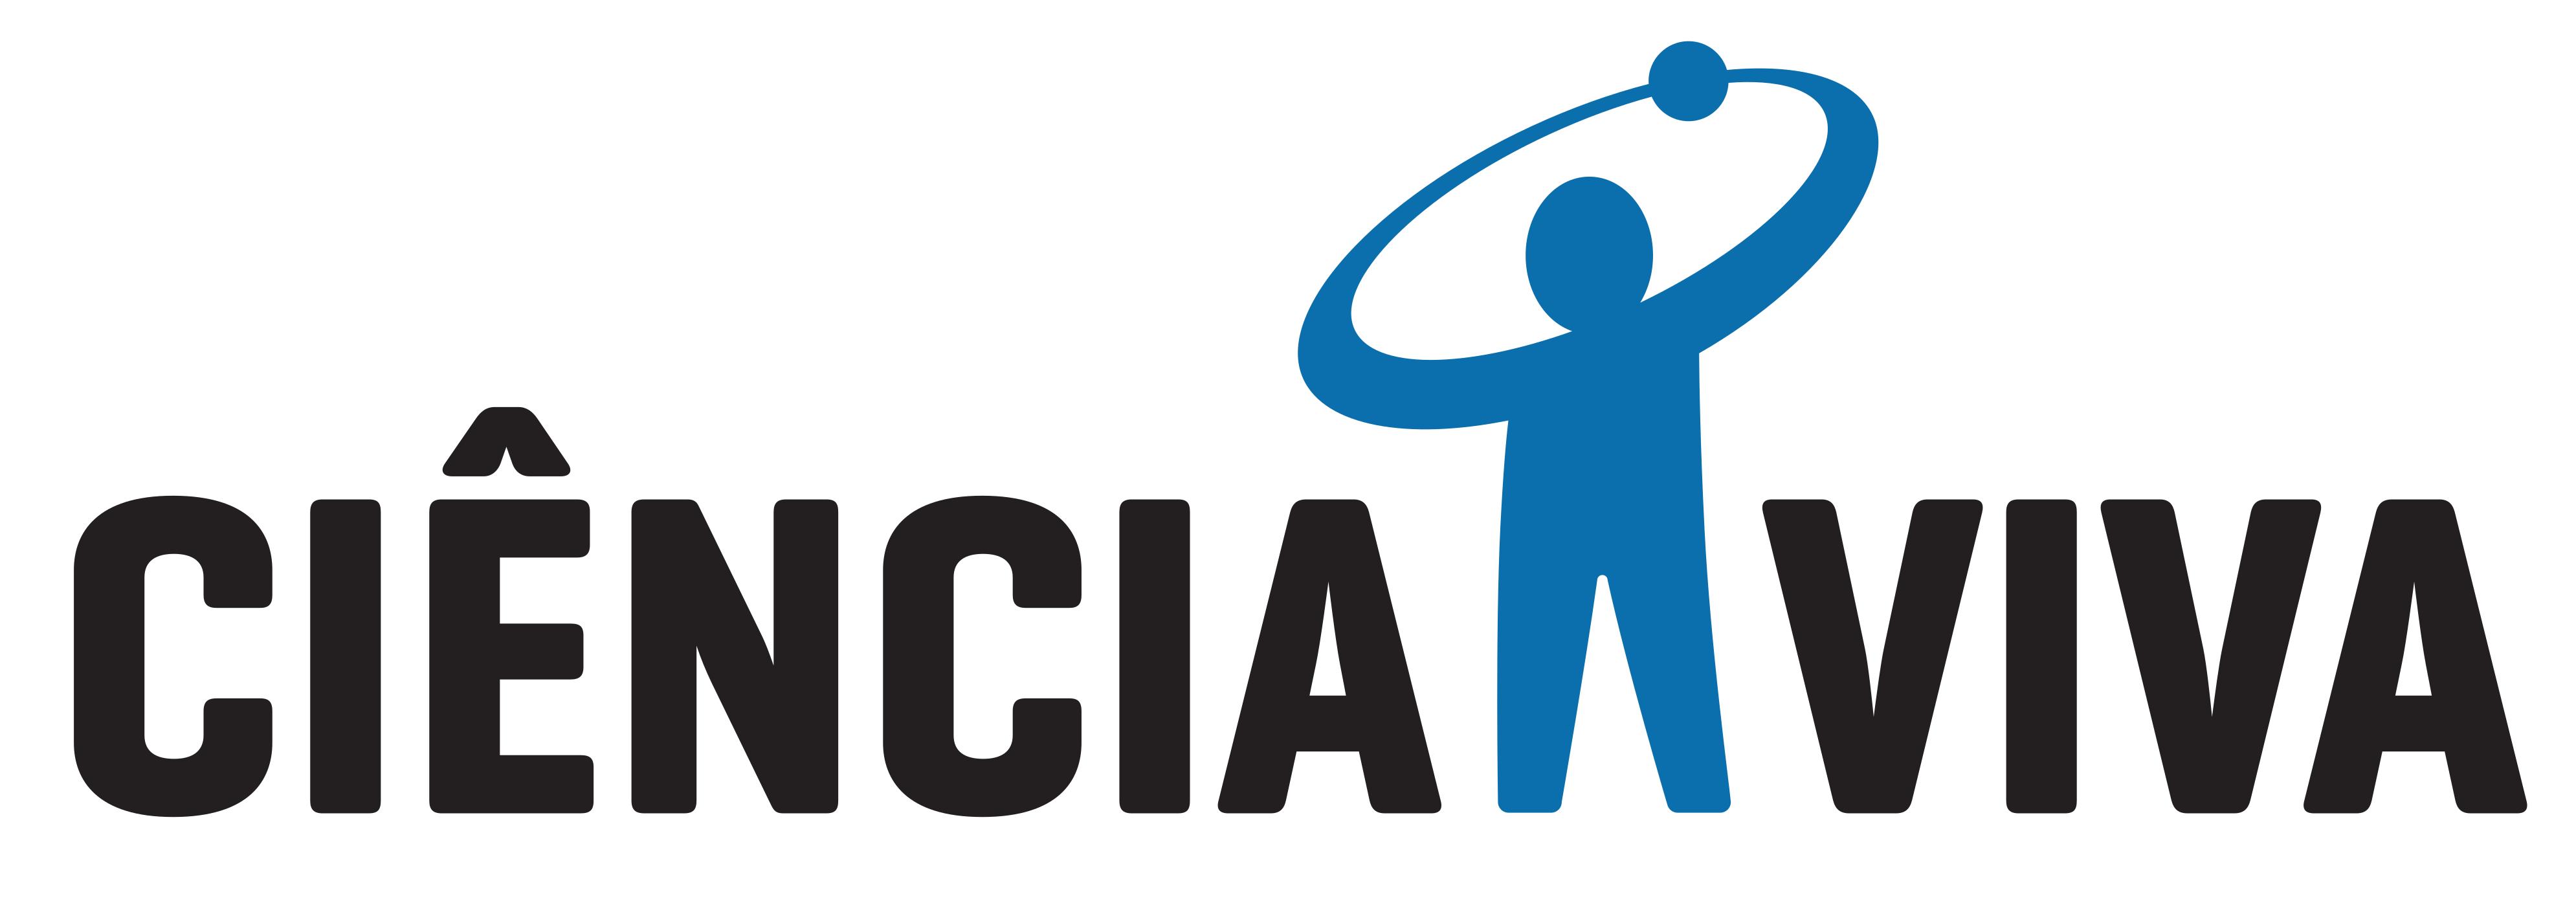 Logotipo Ciência Viva